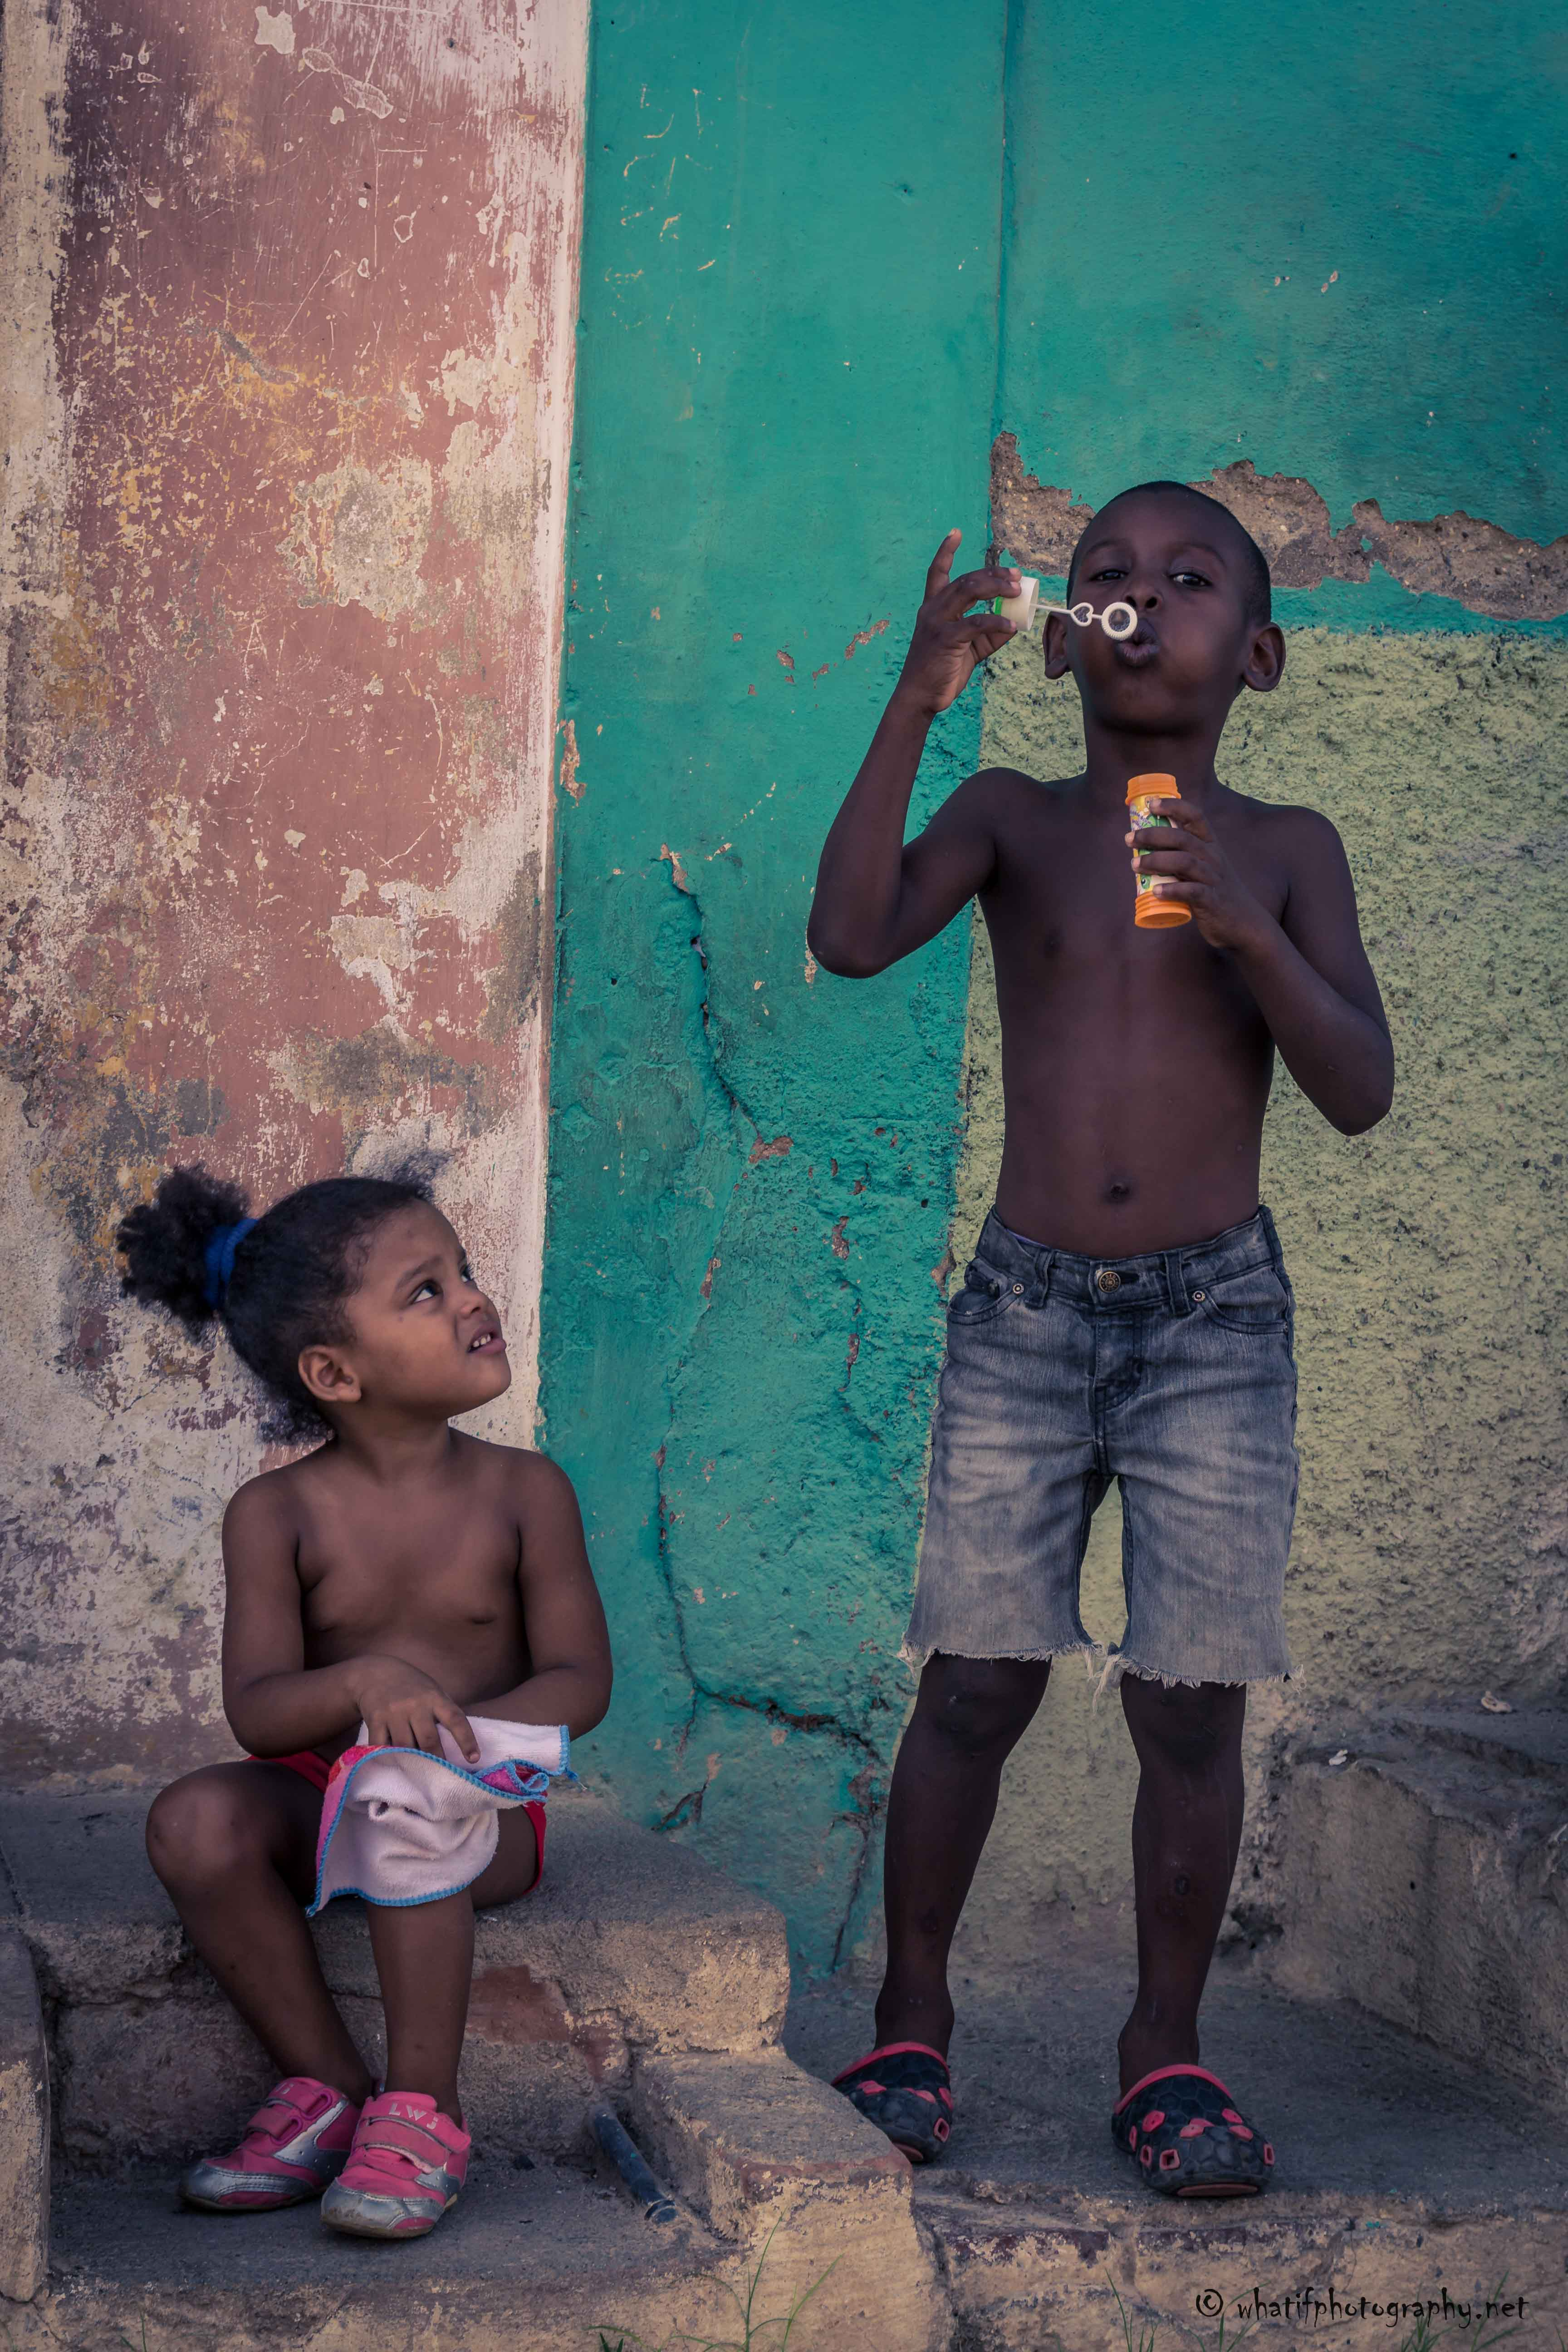 Children's joy